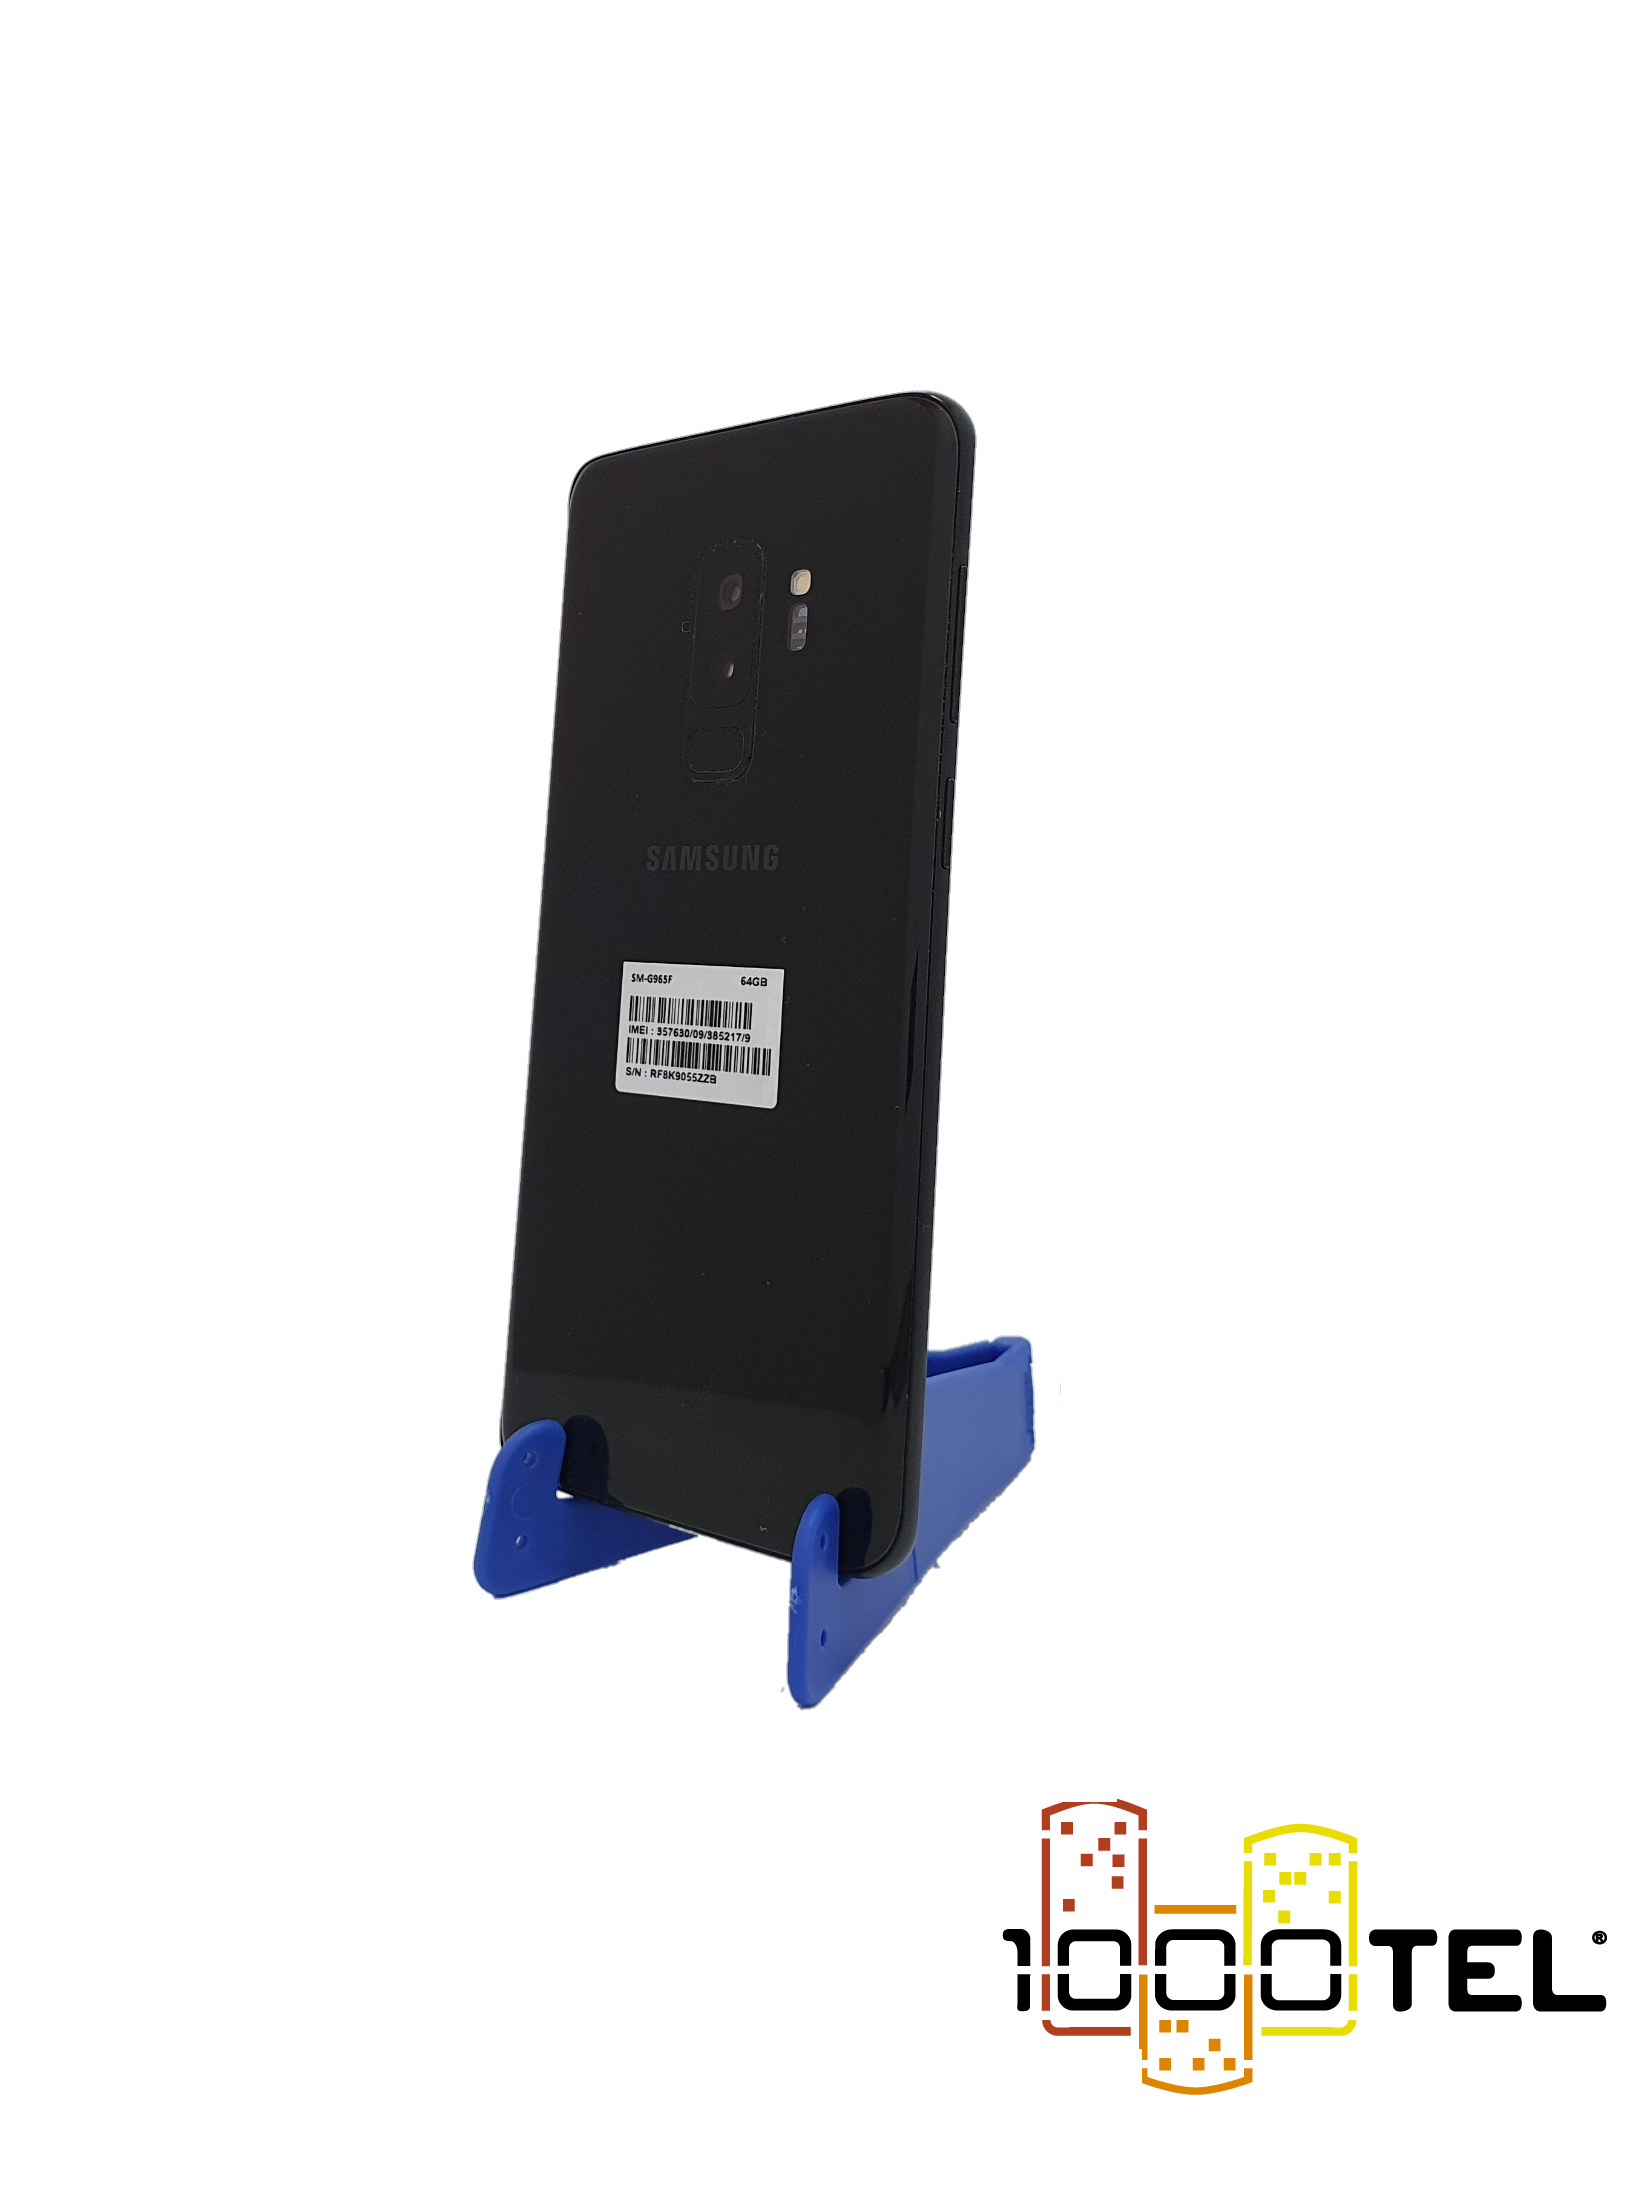 Samsung Galaxy S9 Plus 64GB #4